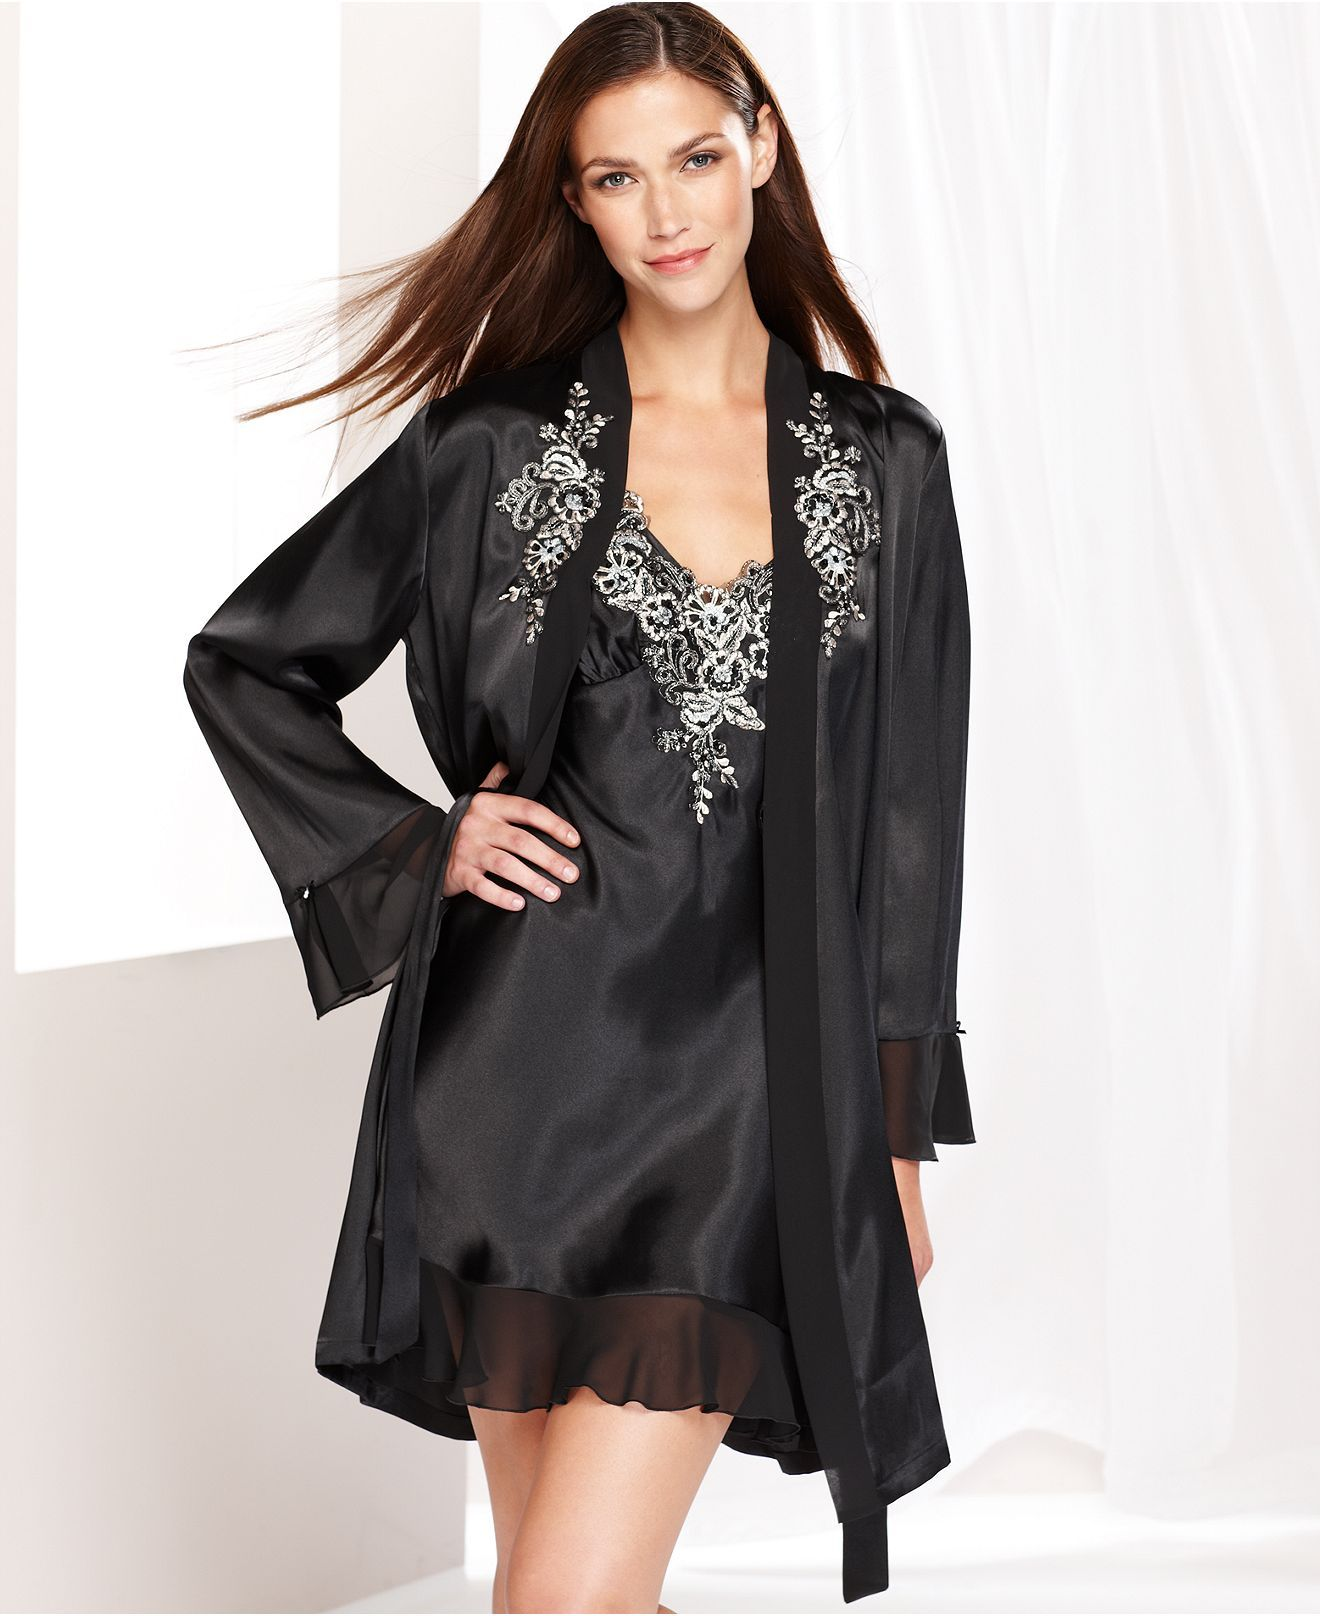 e35890abf6 Linea Donatella Lisette Wrap and Chemise - Bridal Sleepwear - Women - Macy s